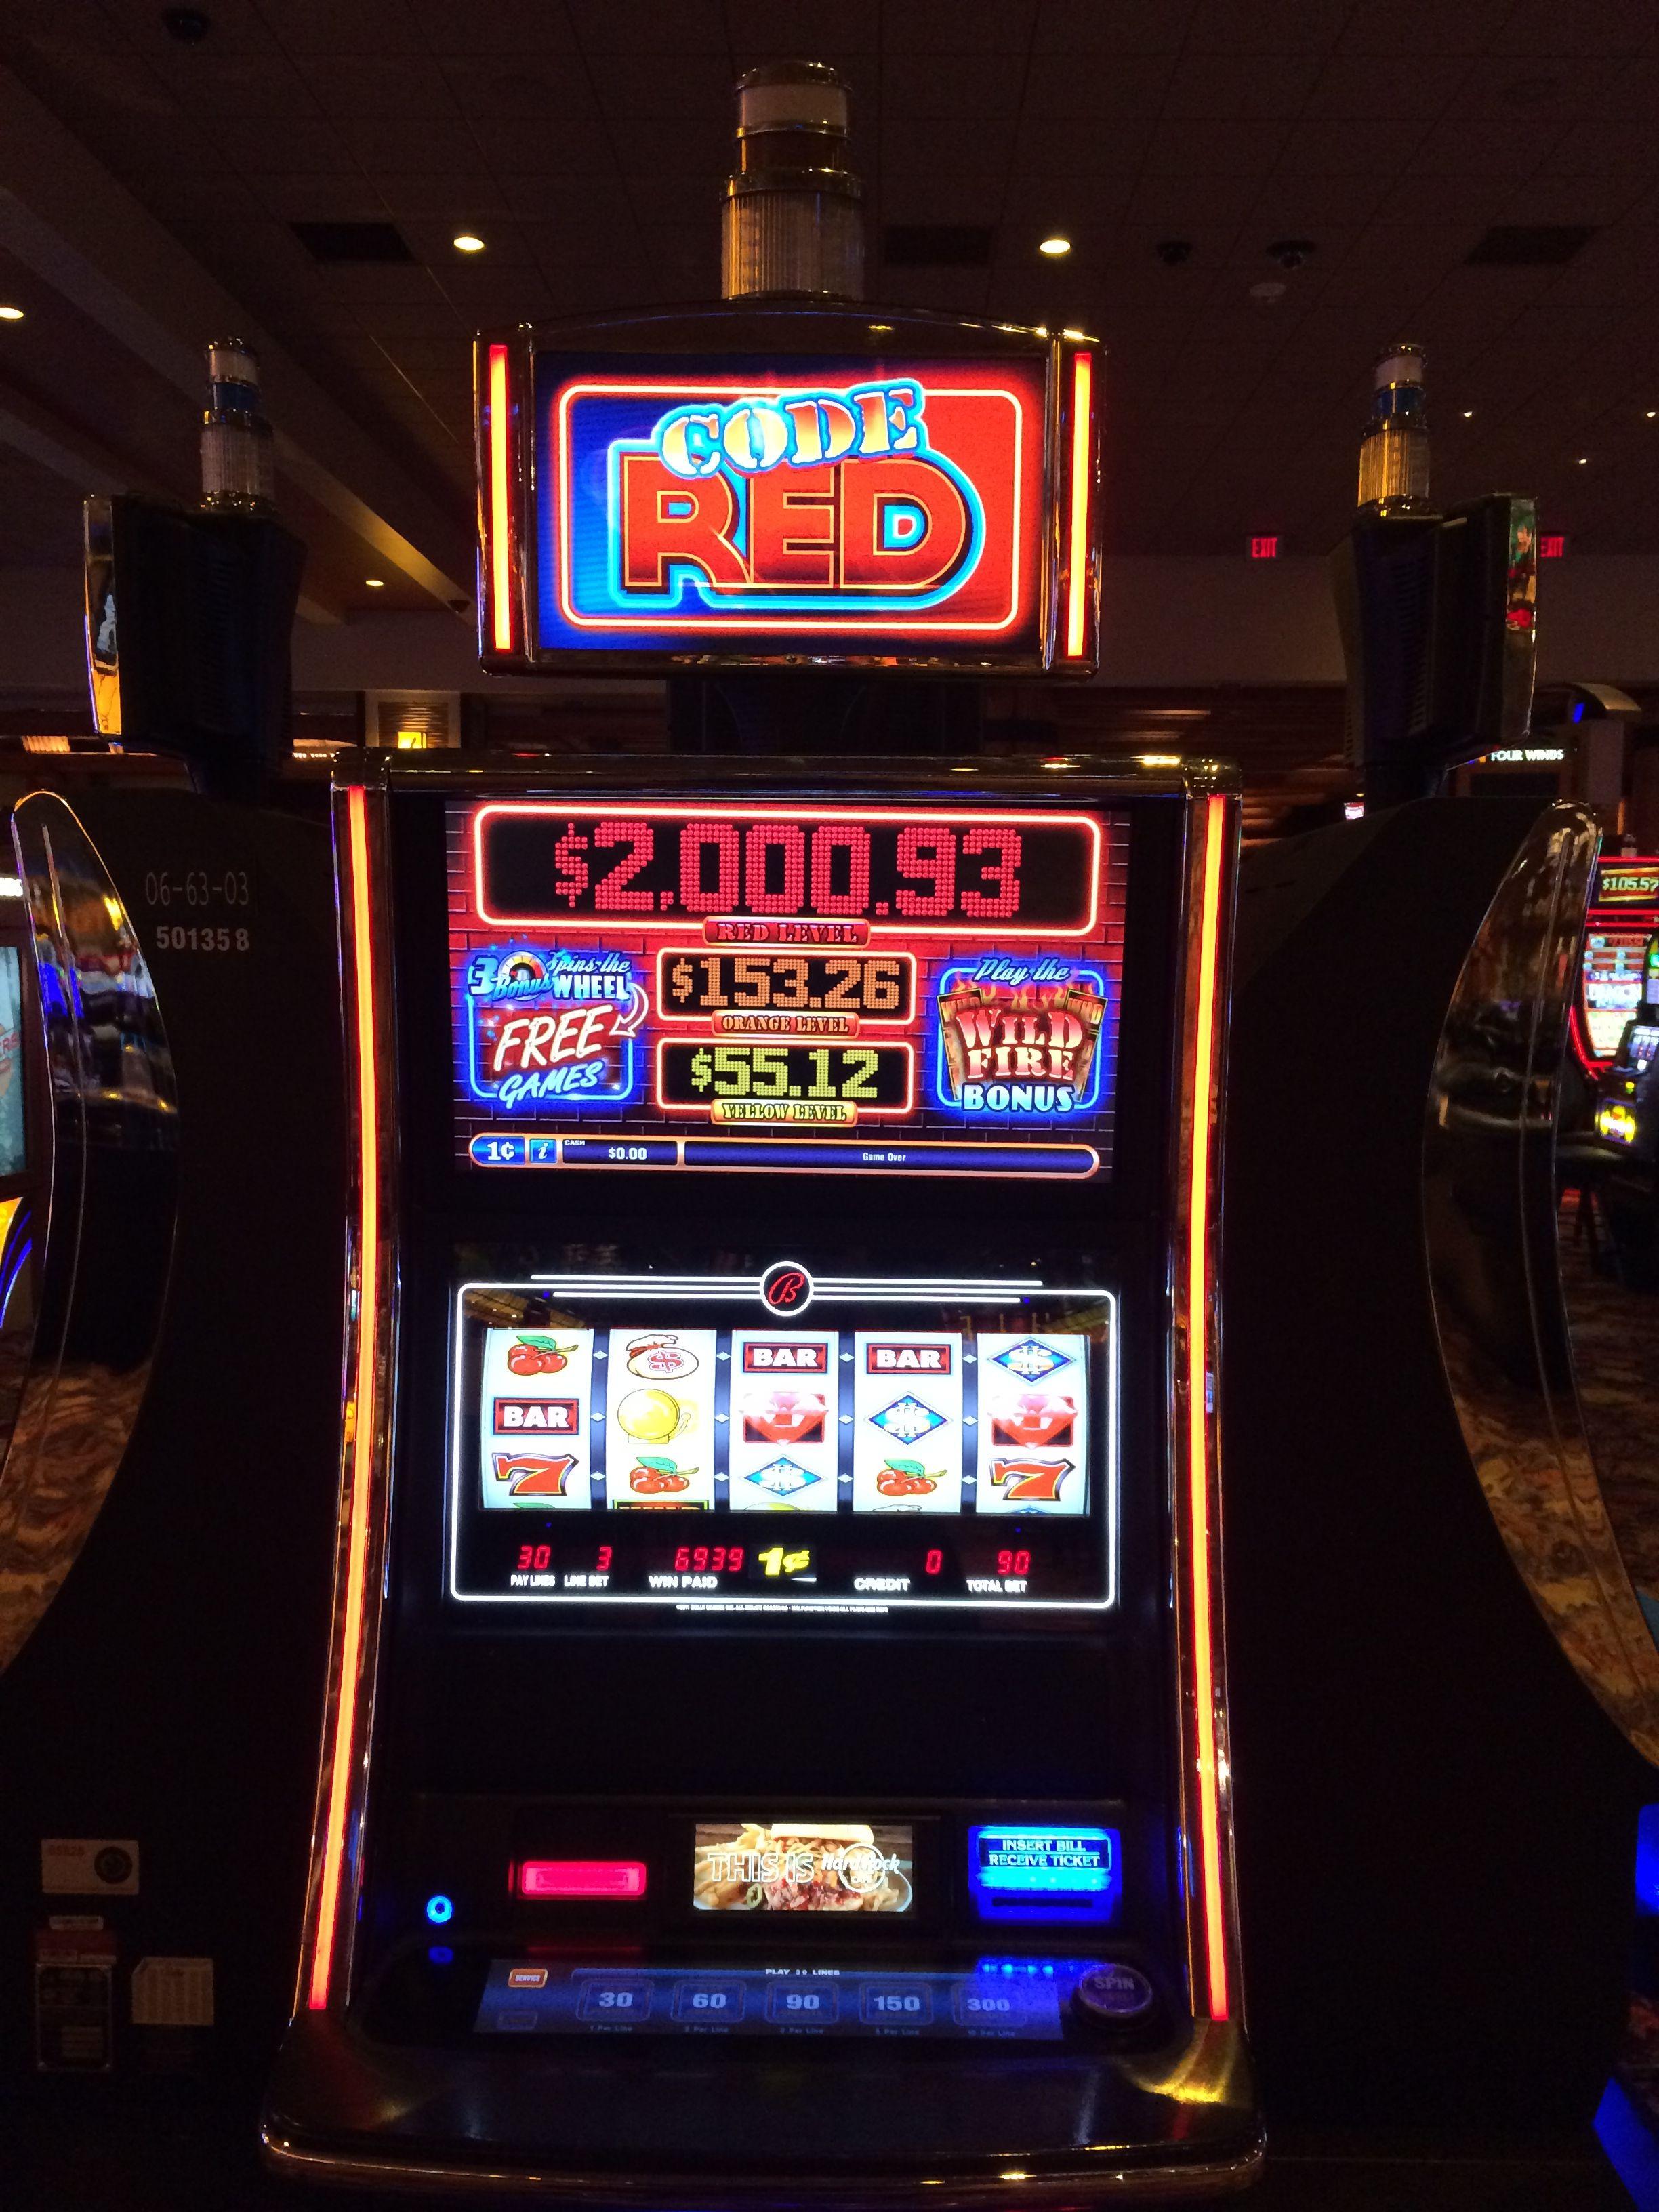 Móvil app 888casino es tragamonedas online buffalo slot machine-311609